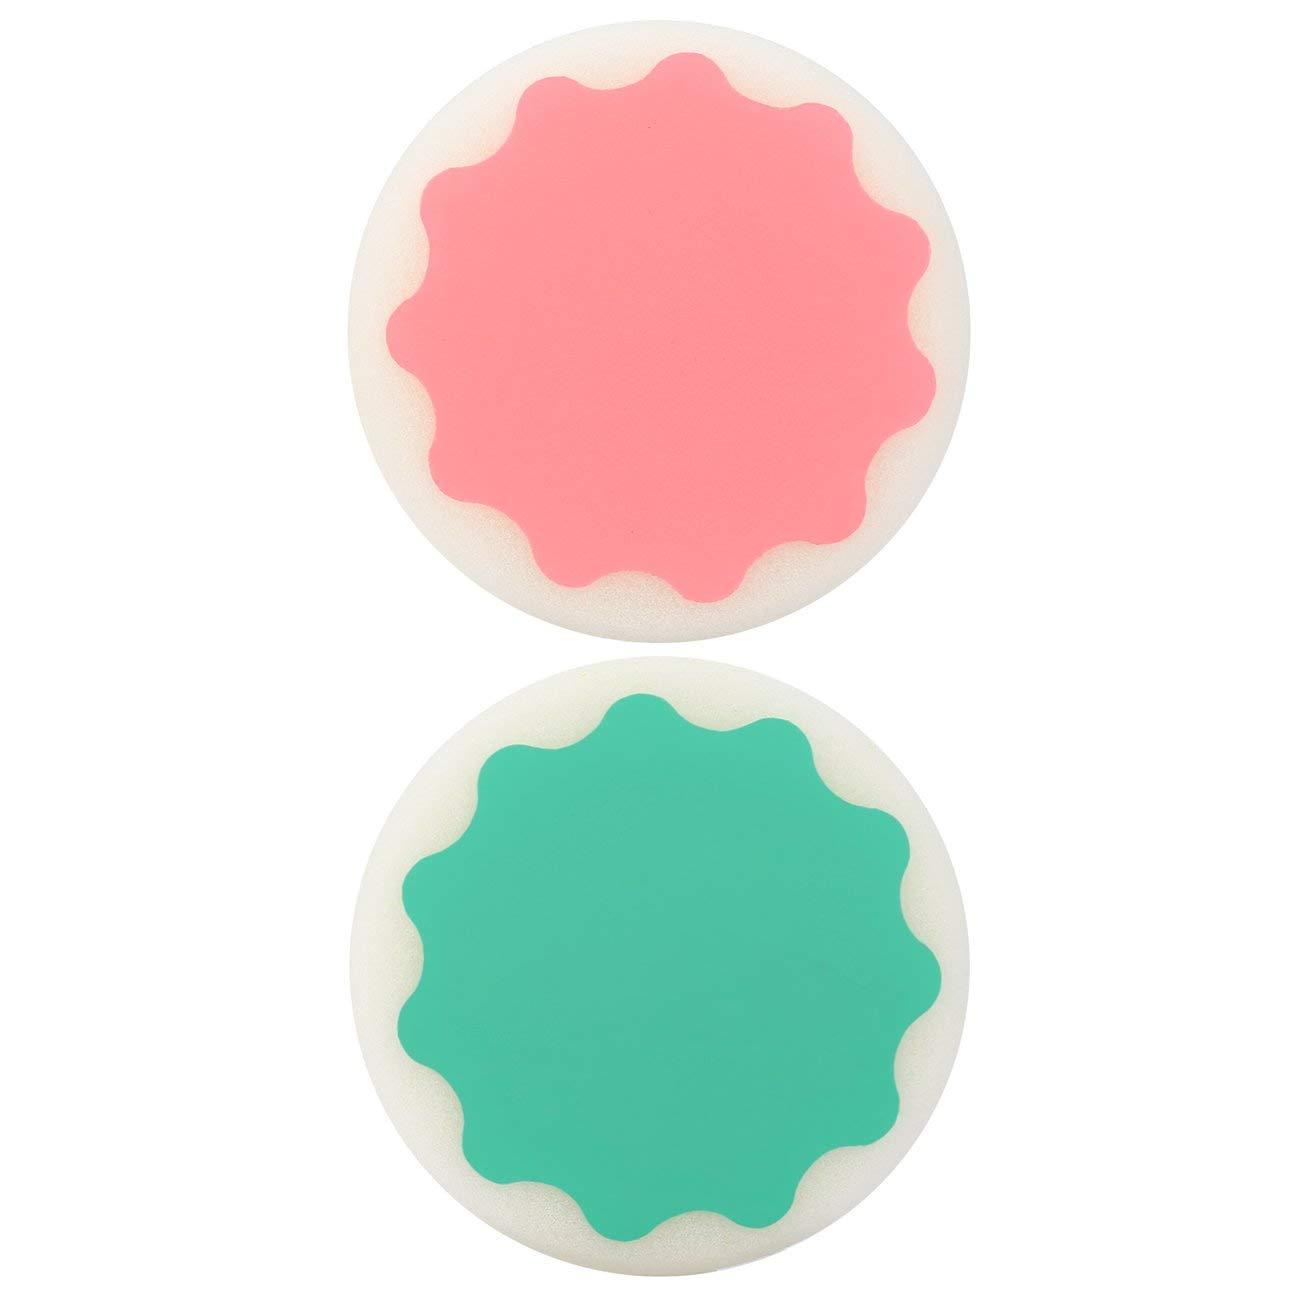 50g Enzima activa natural Jabón de cristal Jabón de cuerpo ...